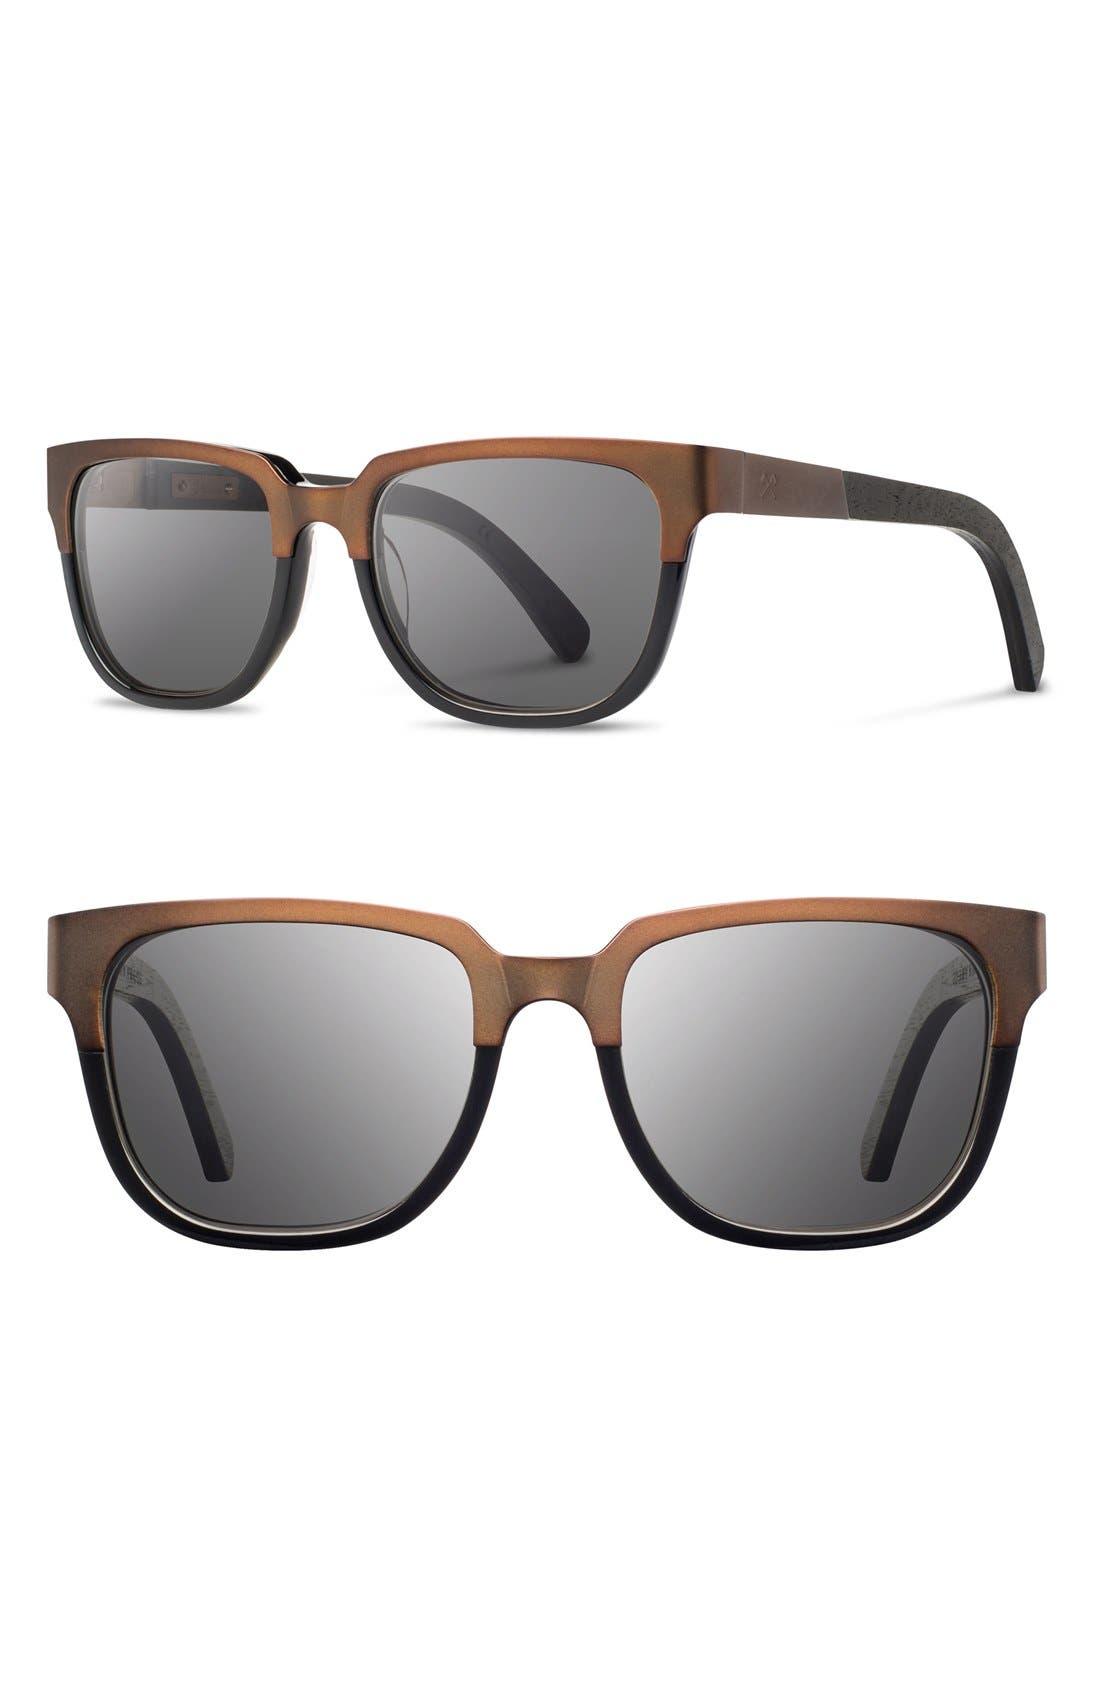 Main Image - Shwood 'Prescott' 52mm Titanium & Wood Sunglasses